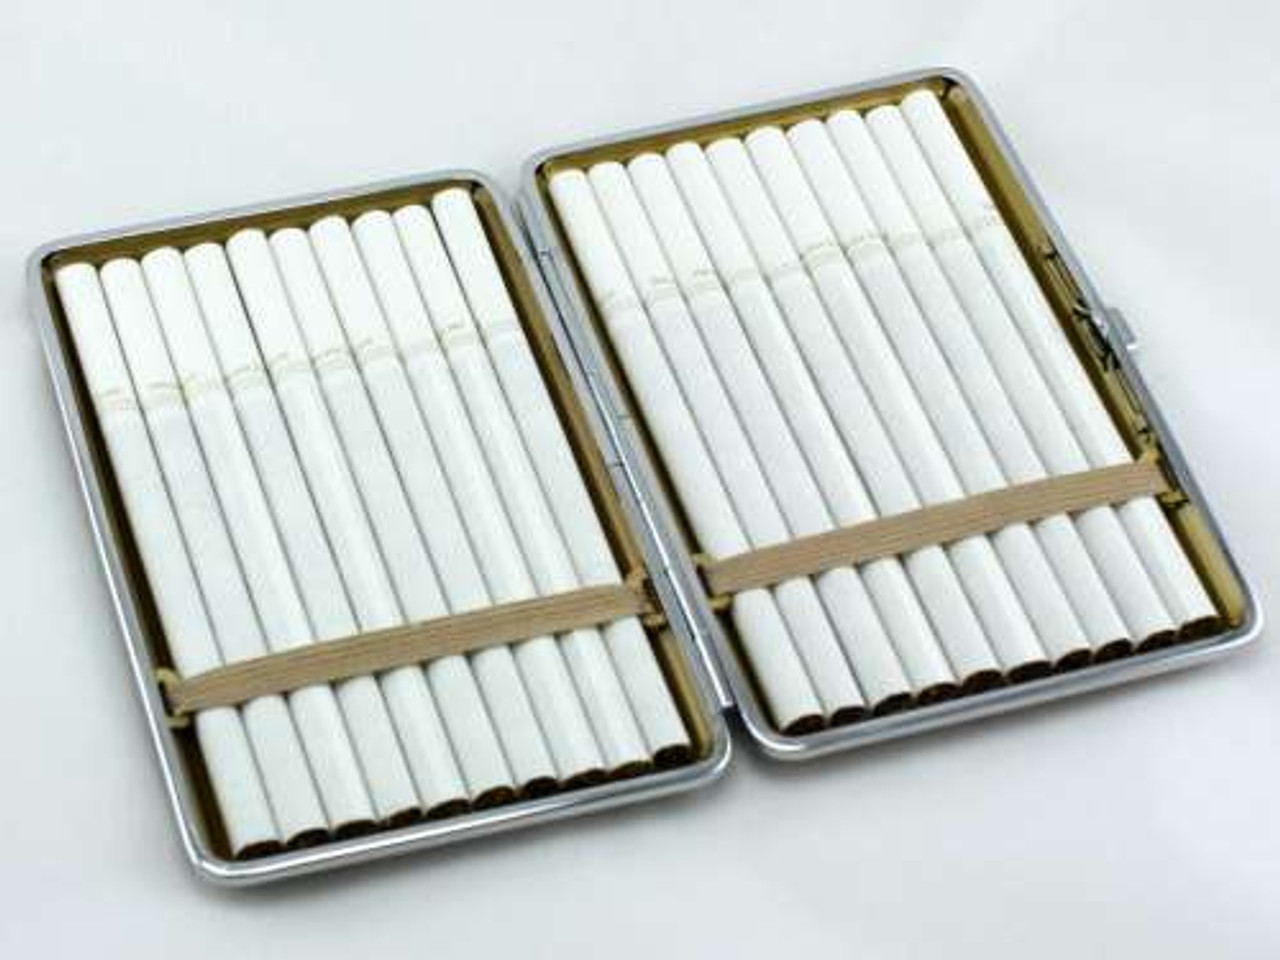 Modern Brown Leather Cigarette Case